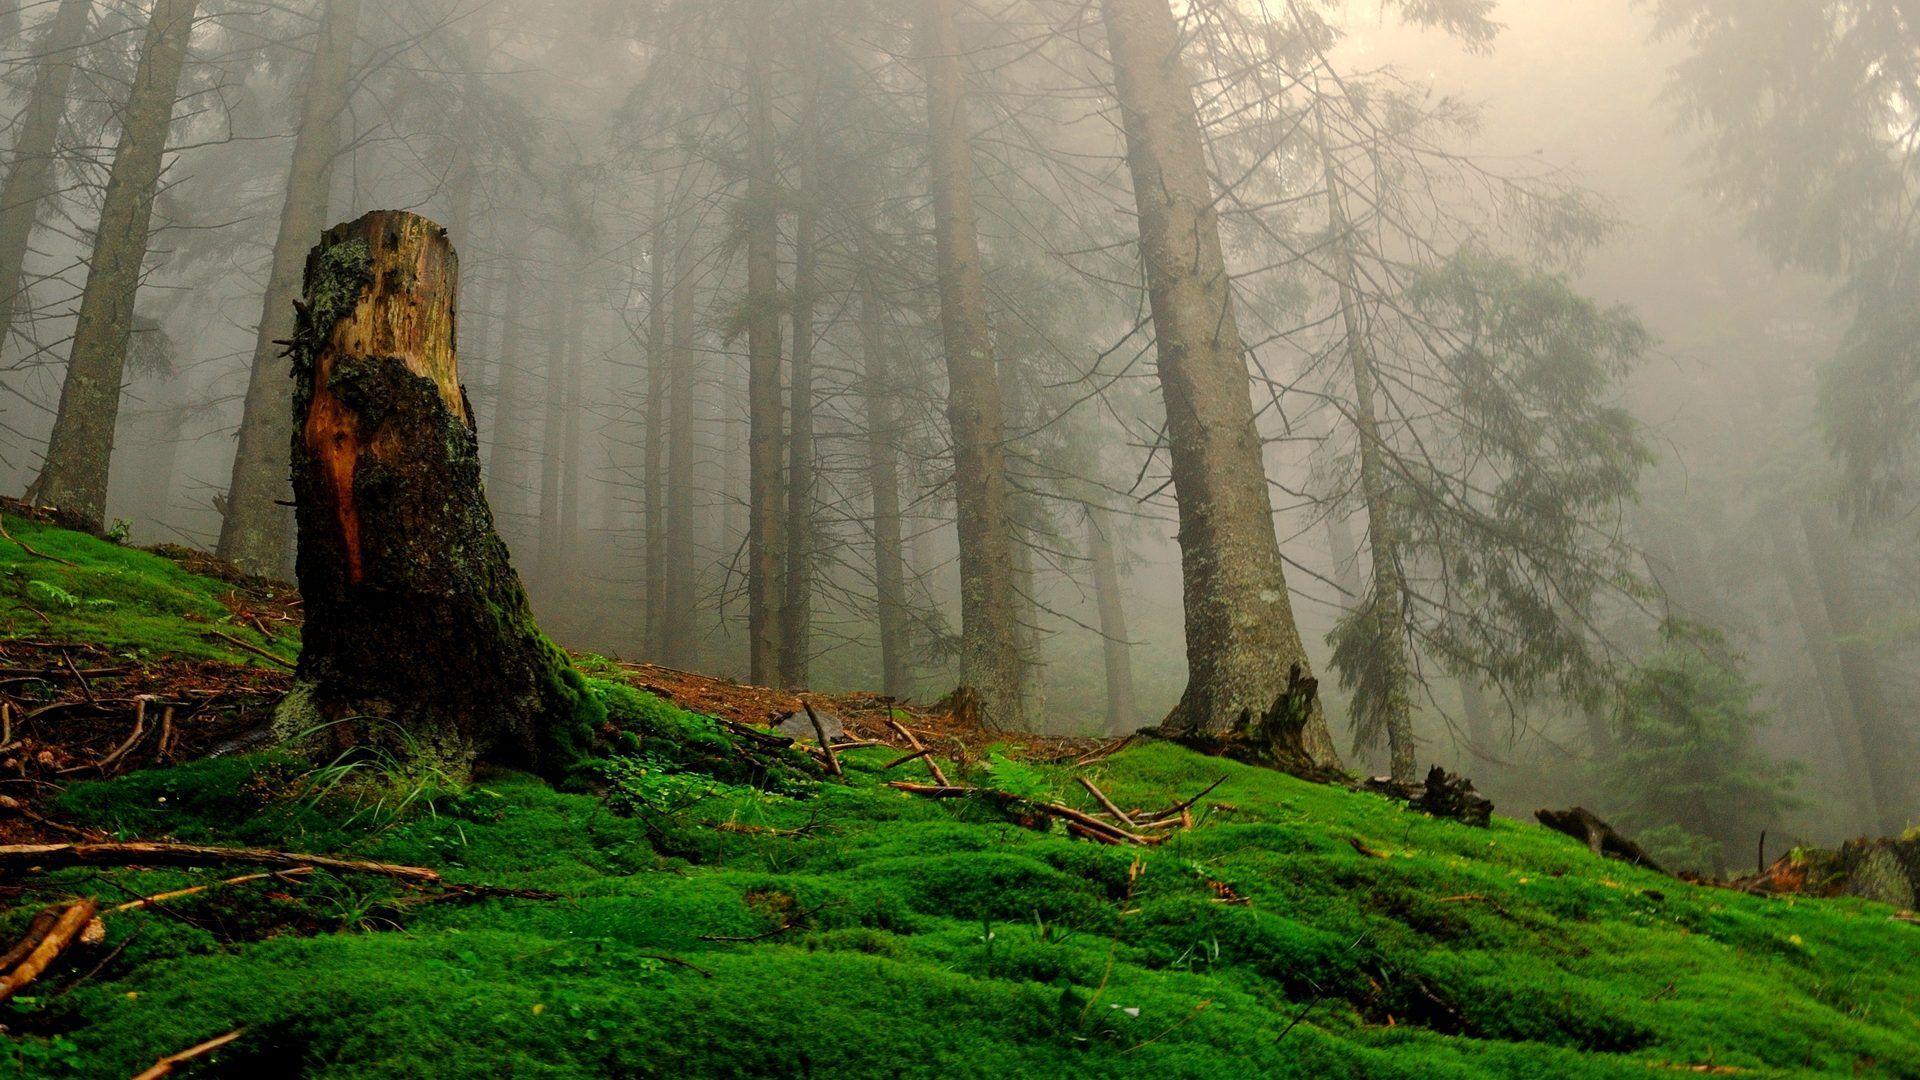 1920x1080 Enchanted Forest Background Tải xuống miễn phí